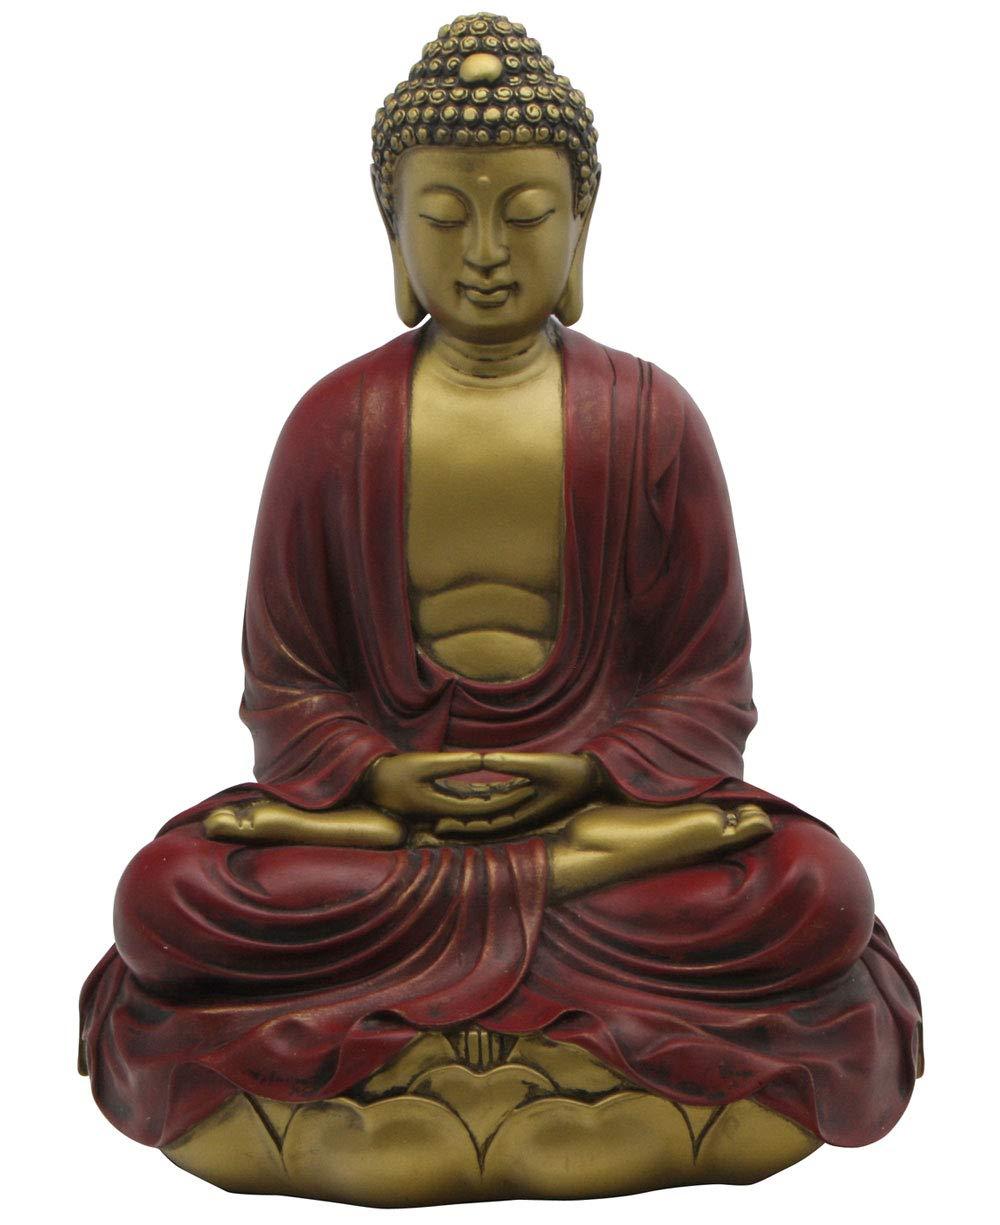 Buddha Groove Premium Quality Serene Meditating Buddha Statue in a Minimalist Design, Multiple Colors Red-Gold